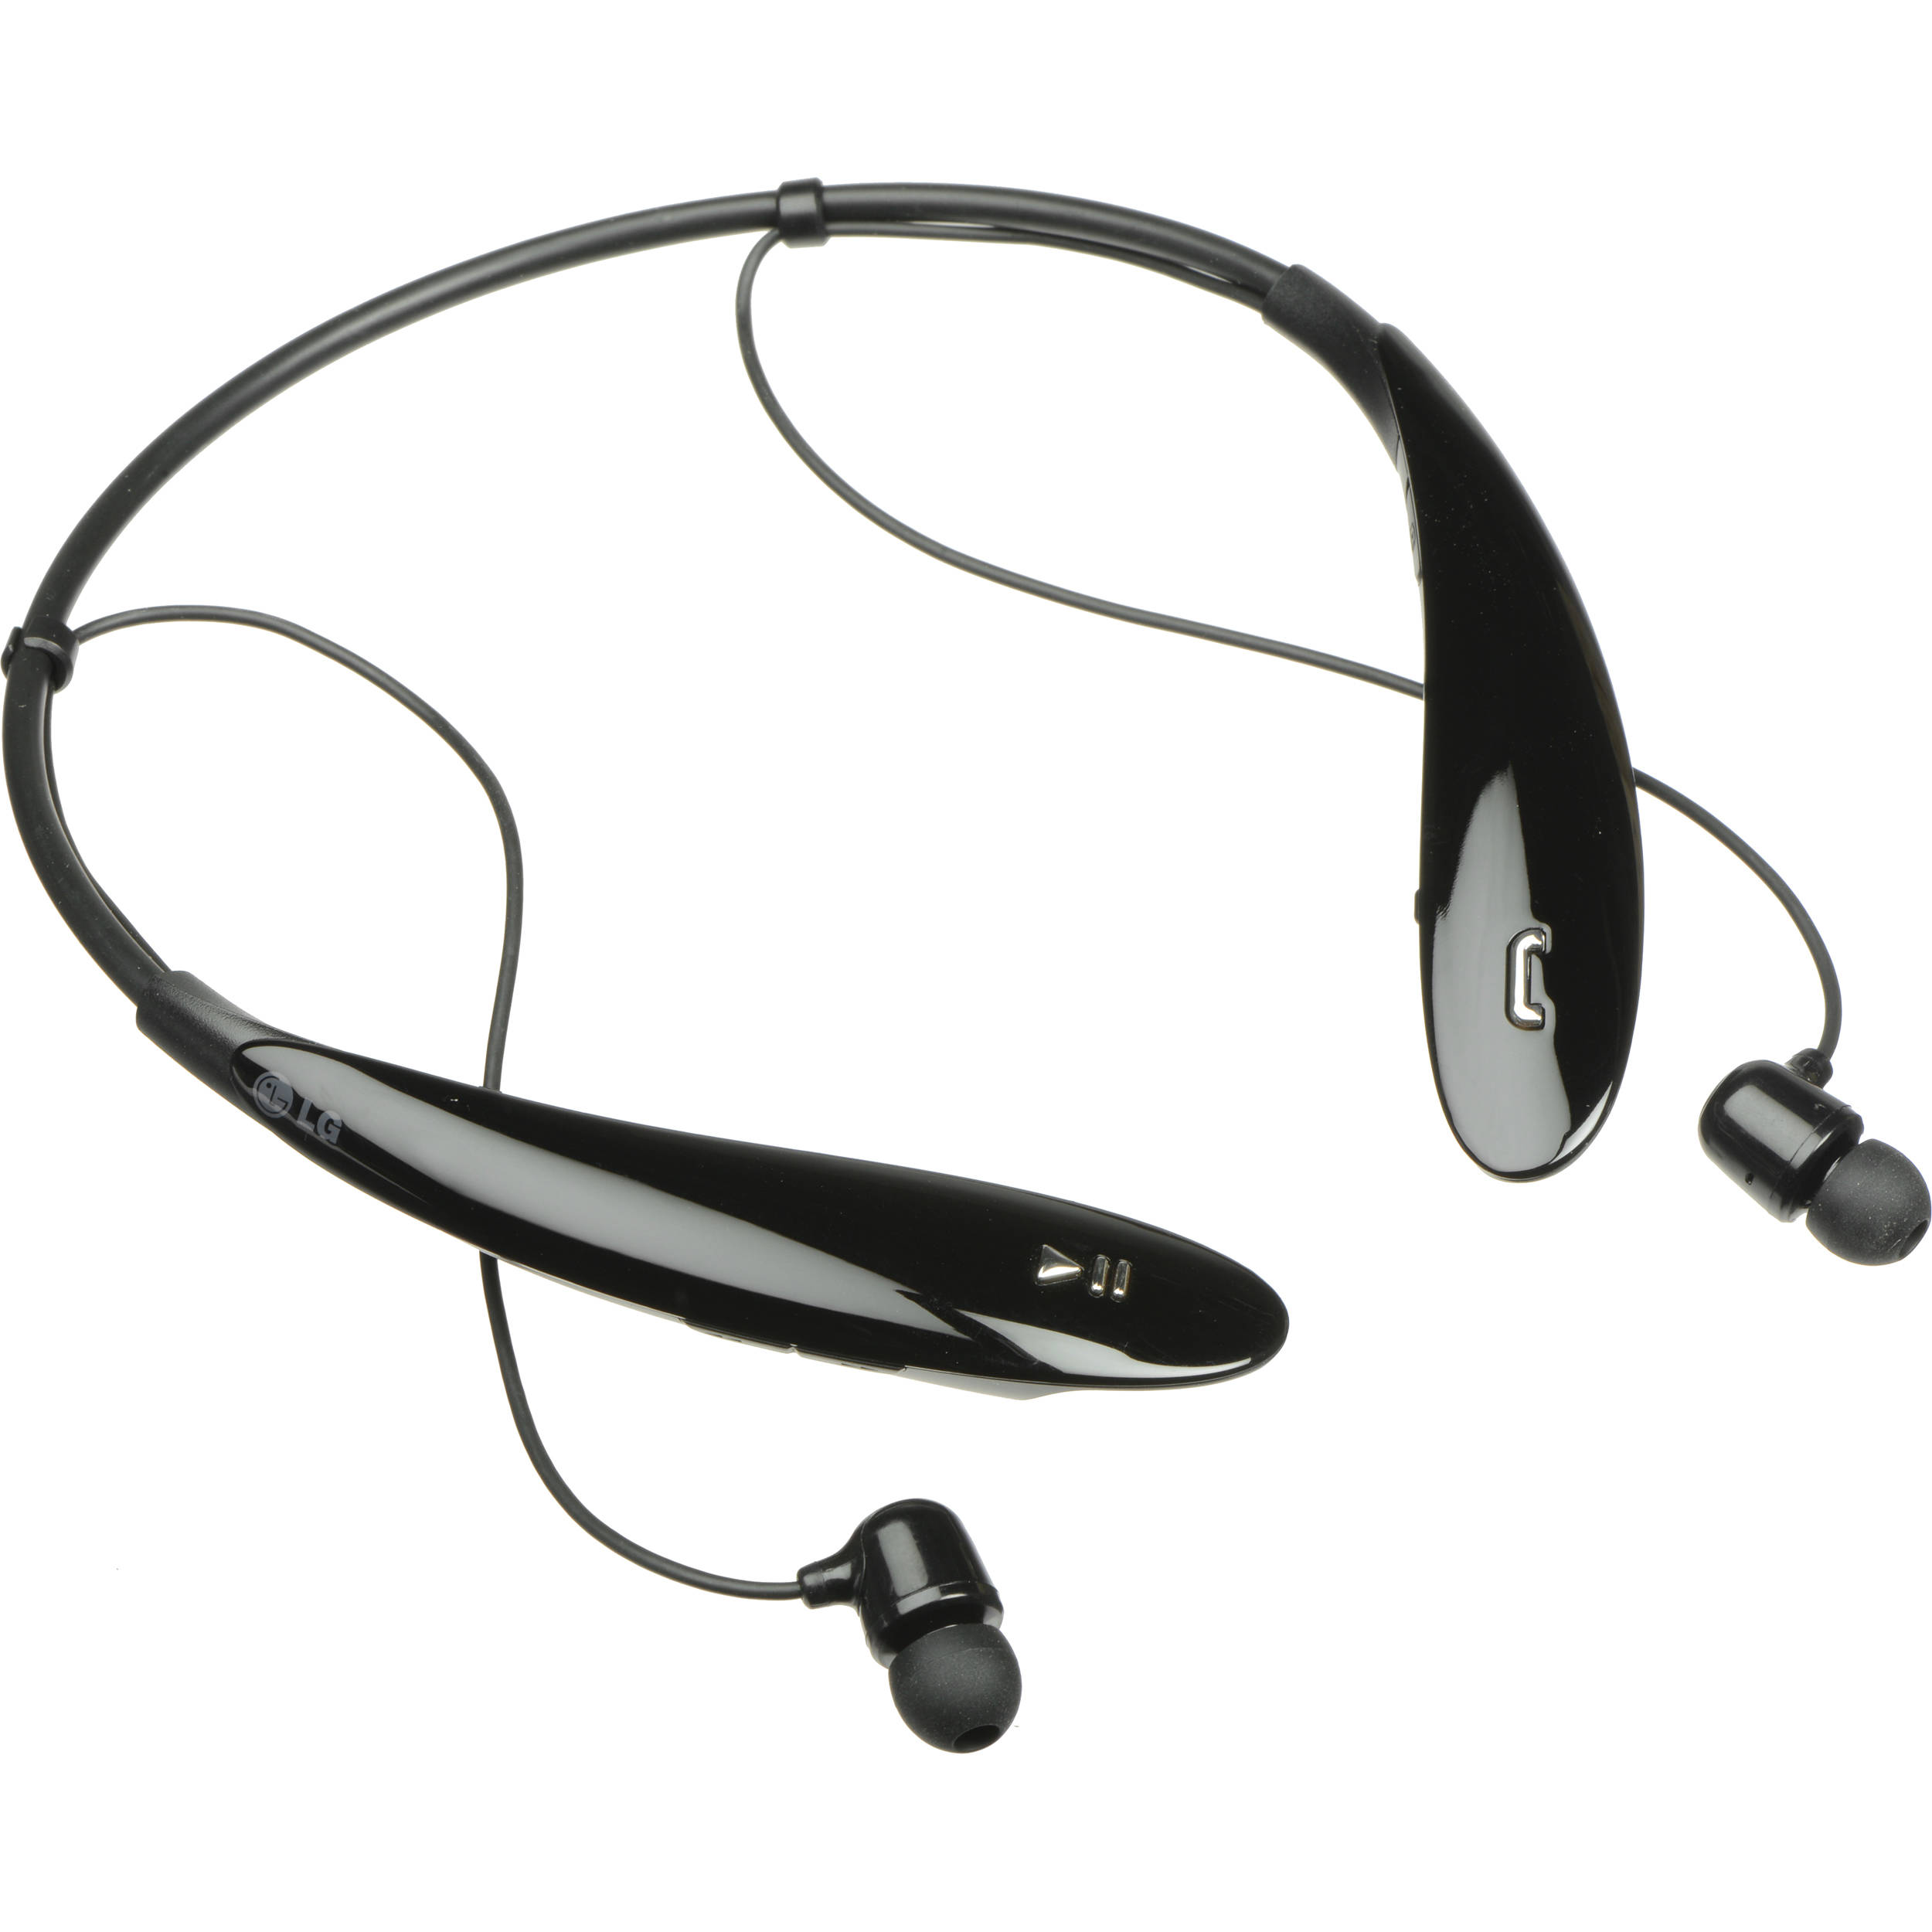 LG HBS-800 Tone Ultra Bluetooth Noise Cancelling HBS-800.ACUSBKK